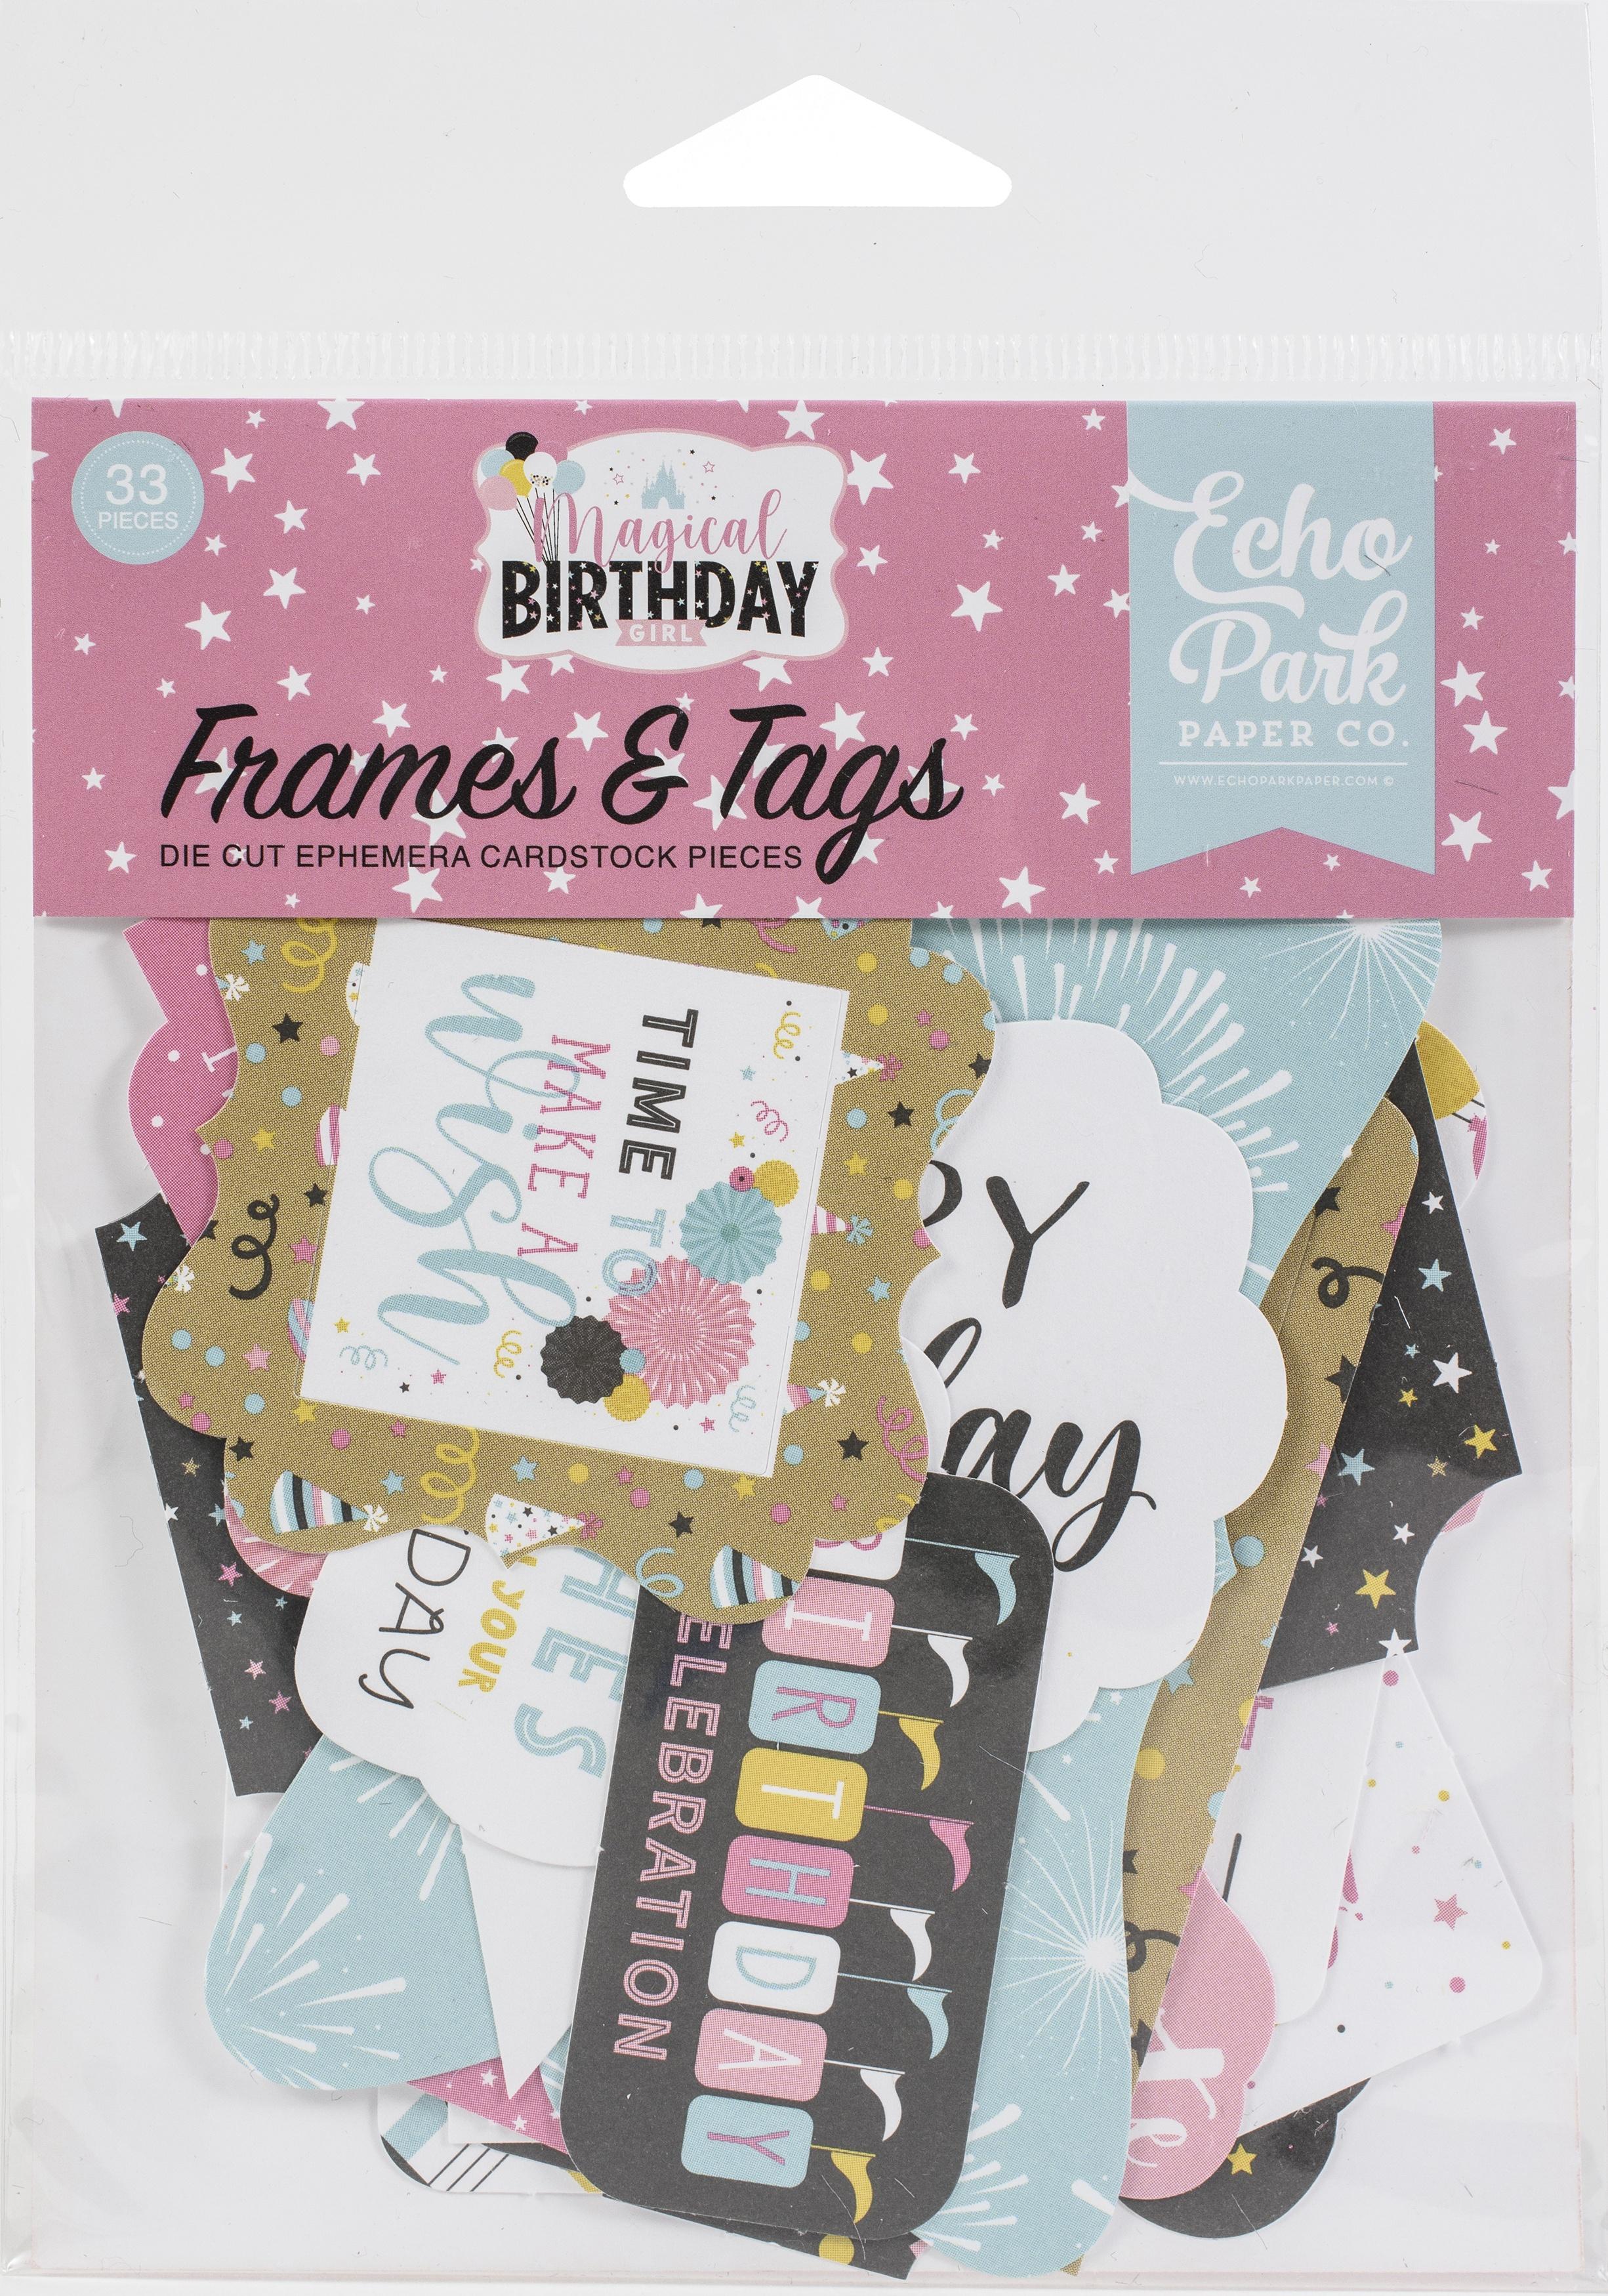 Echo Park - Magical Birthday Girl - Frames & Tags Cardstock Ephemera